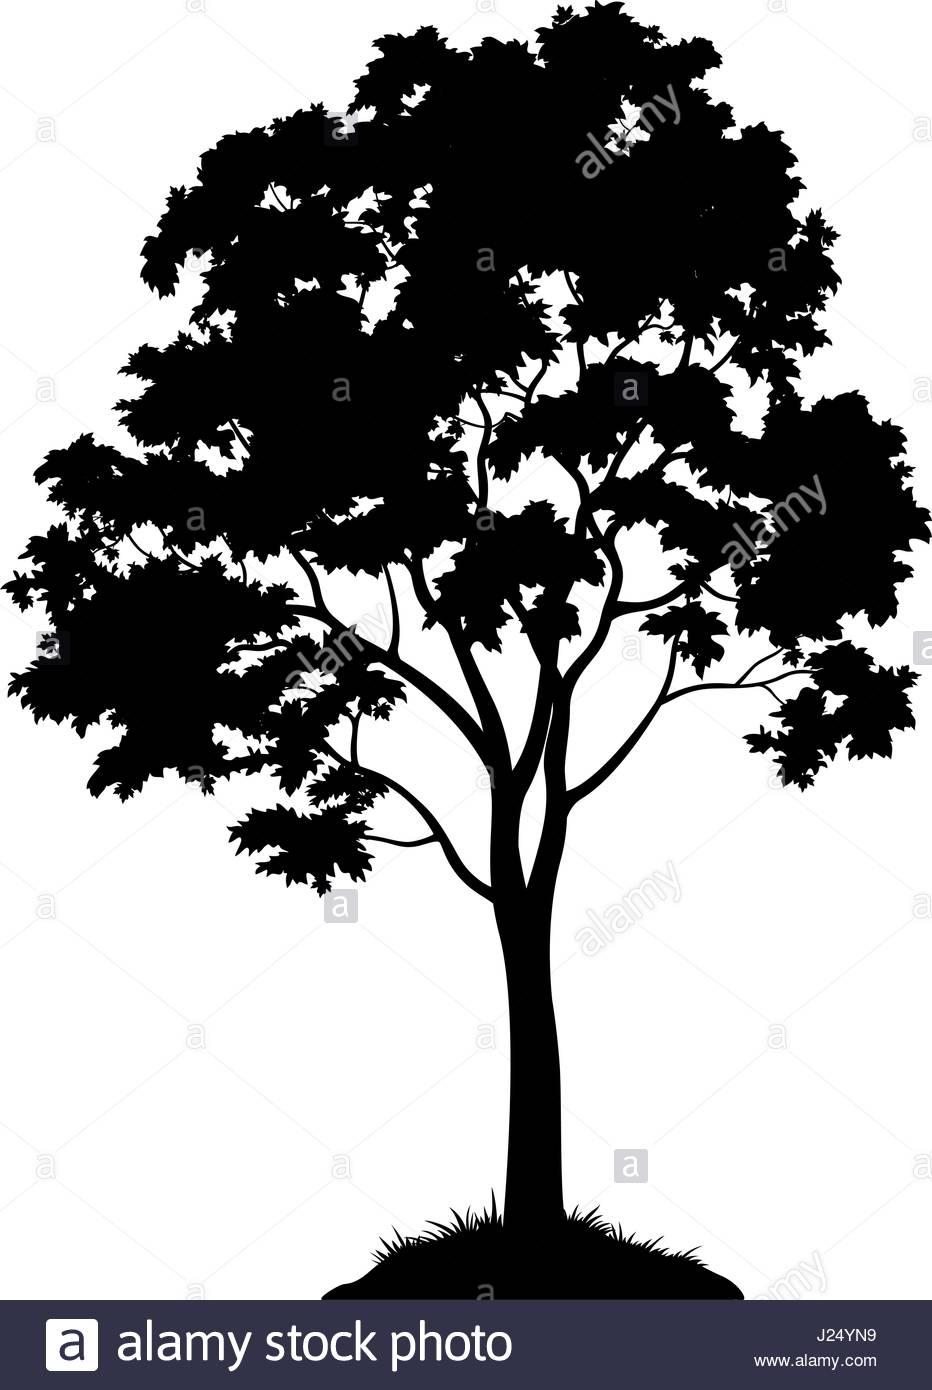 932x1390 Maple Tree Silhouette Stock Vector Art Amp Illustration, Vector